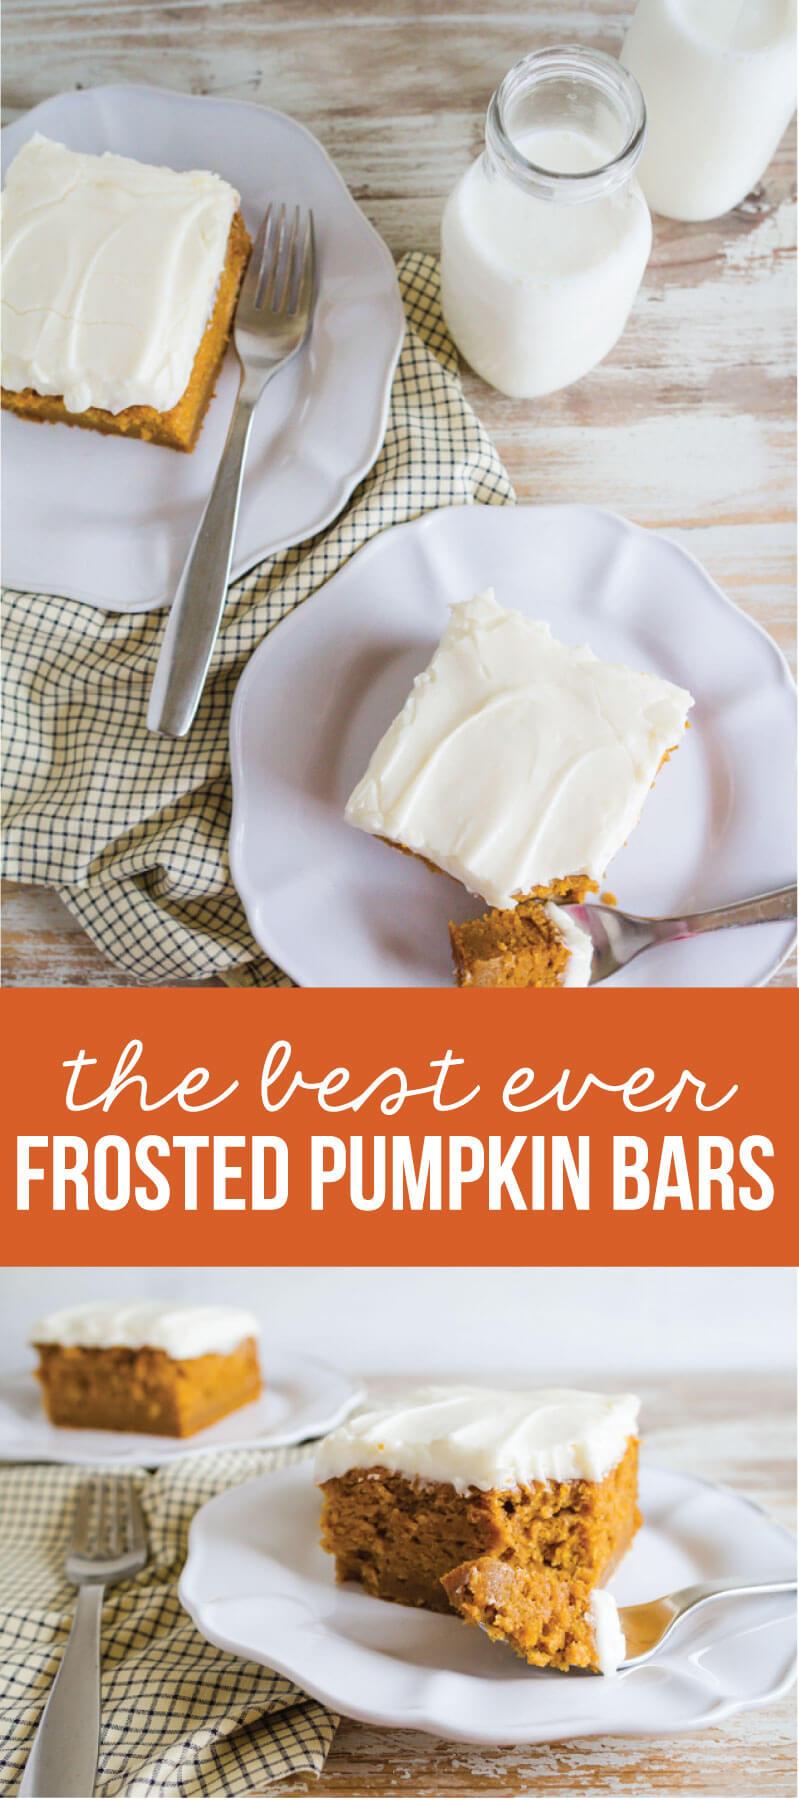 the Best Pumpkin Bars you'll ever eat via www.thirtyhandmadedays.com